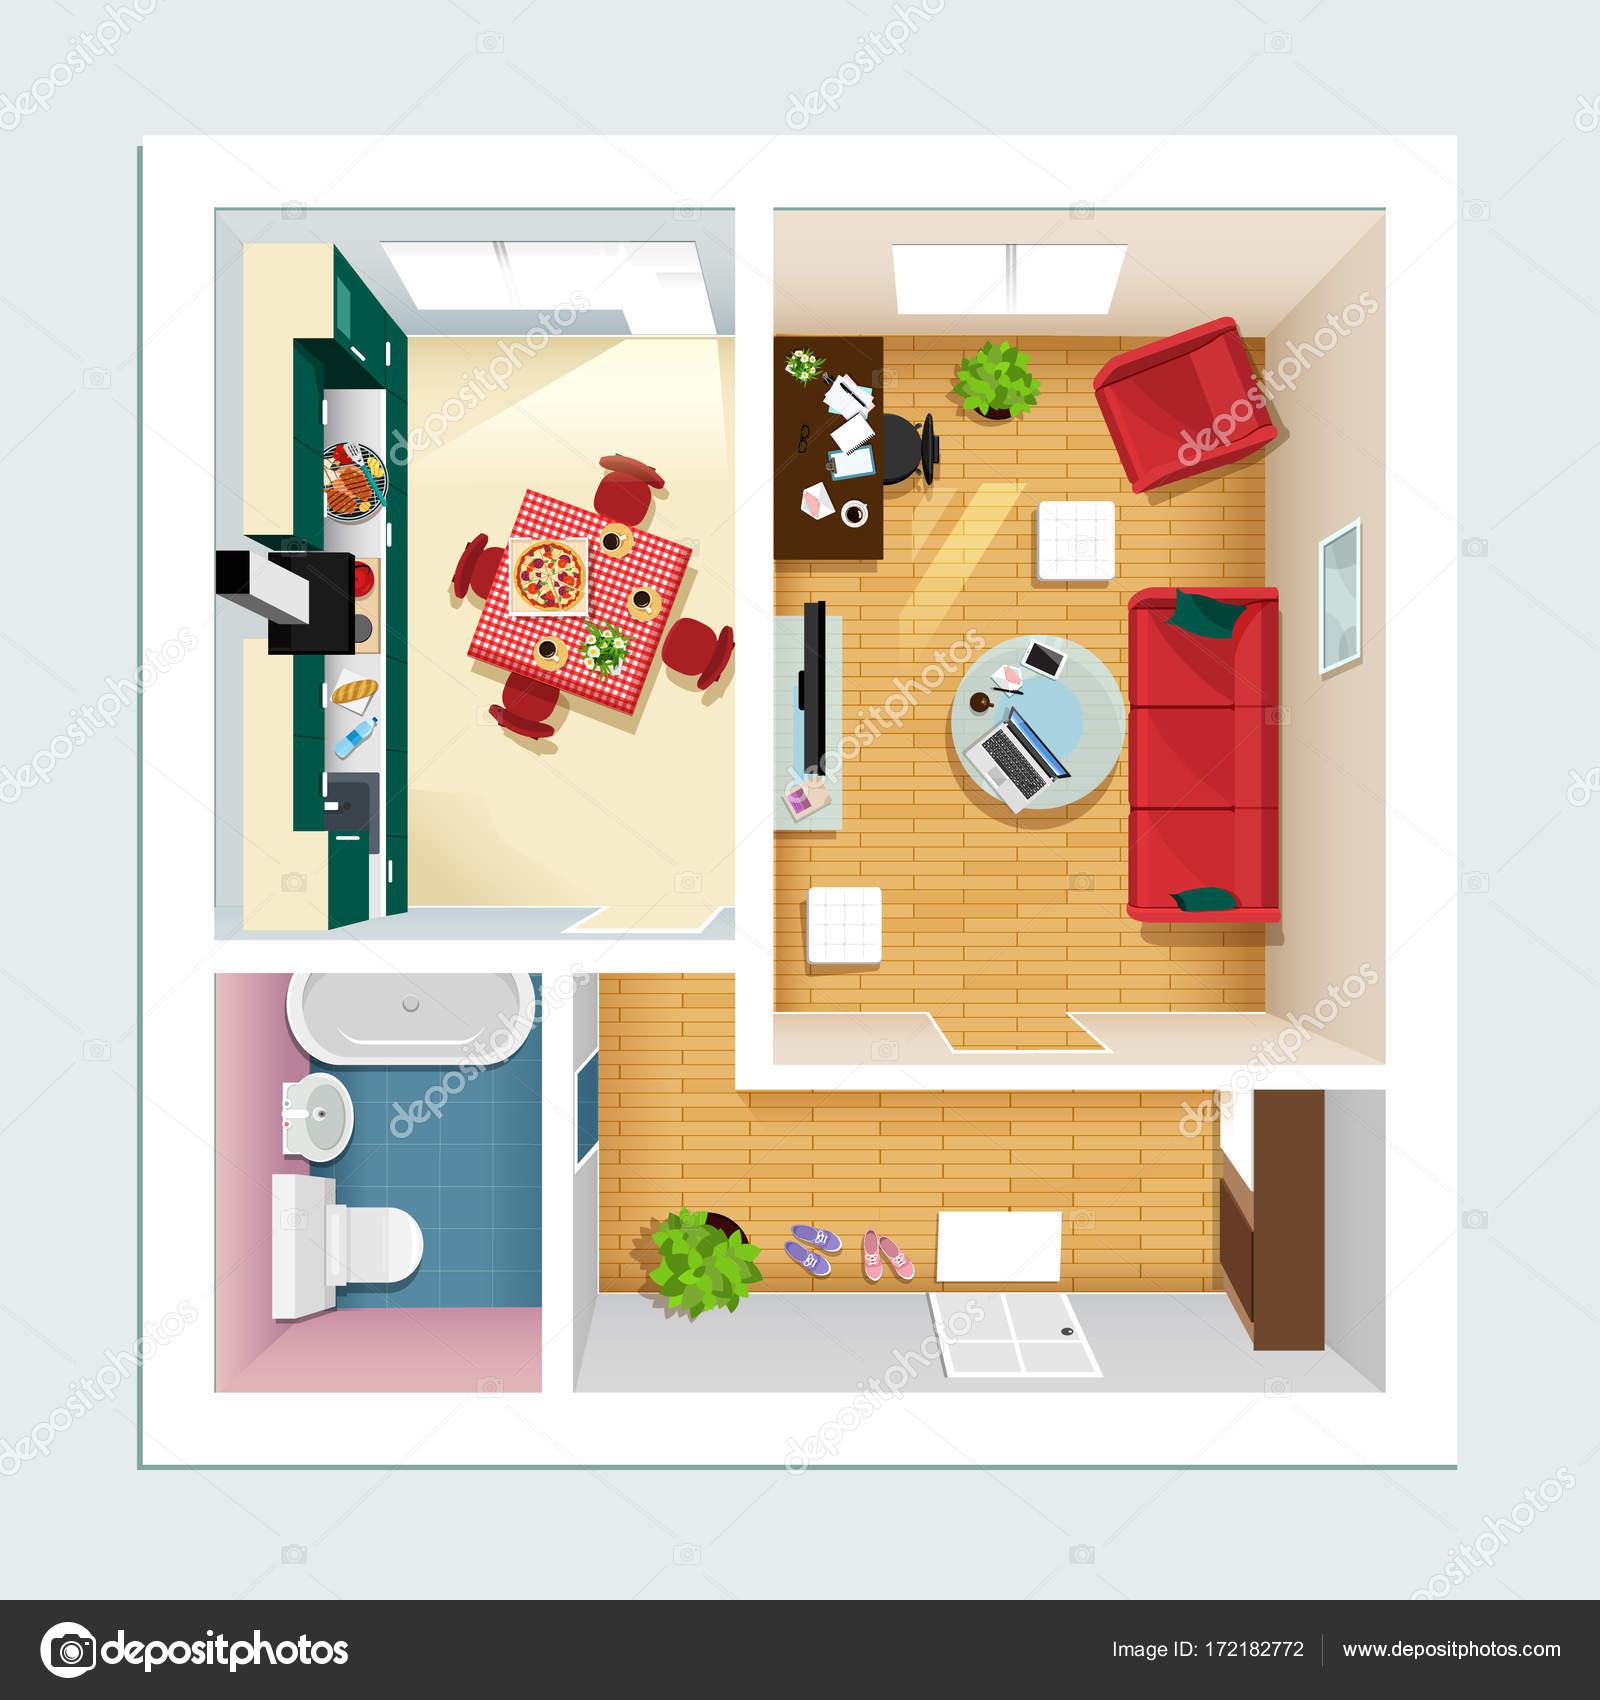 Moderne gedetailleerde plattegrond appartement met keuken, woonkamer ...